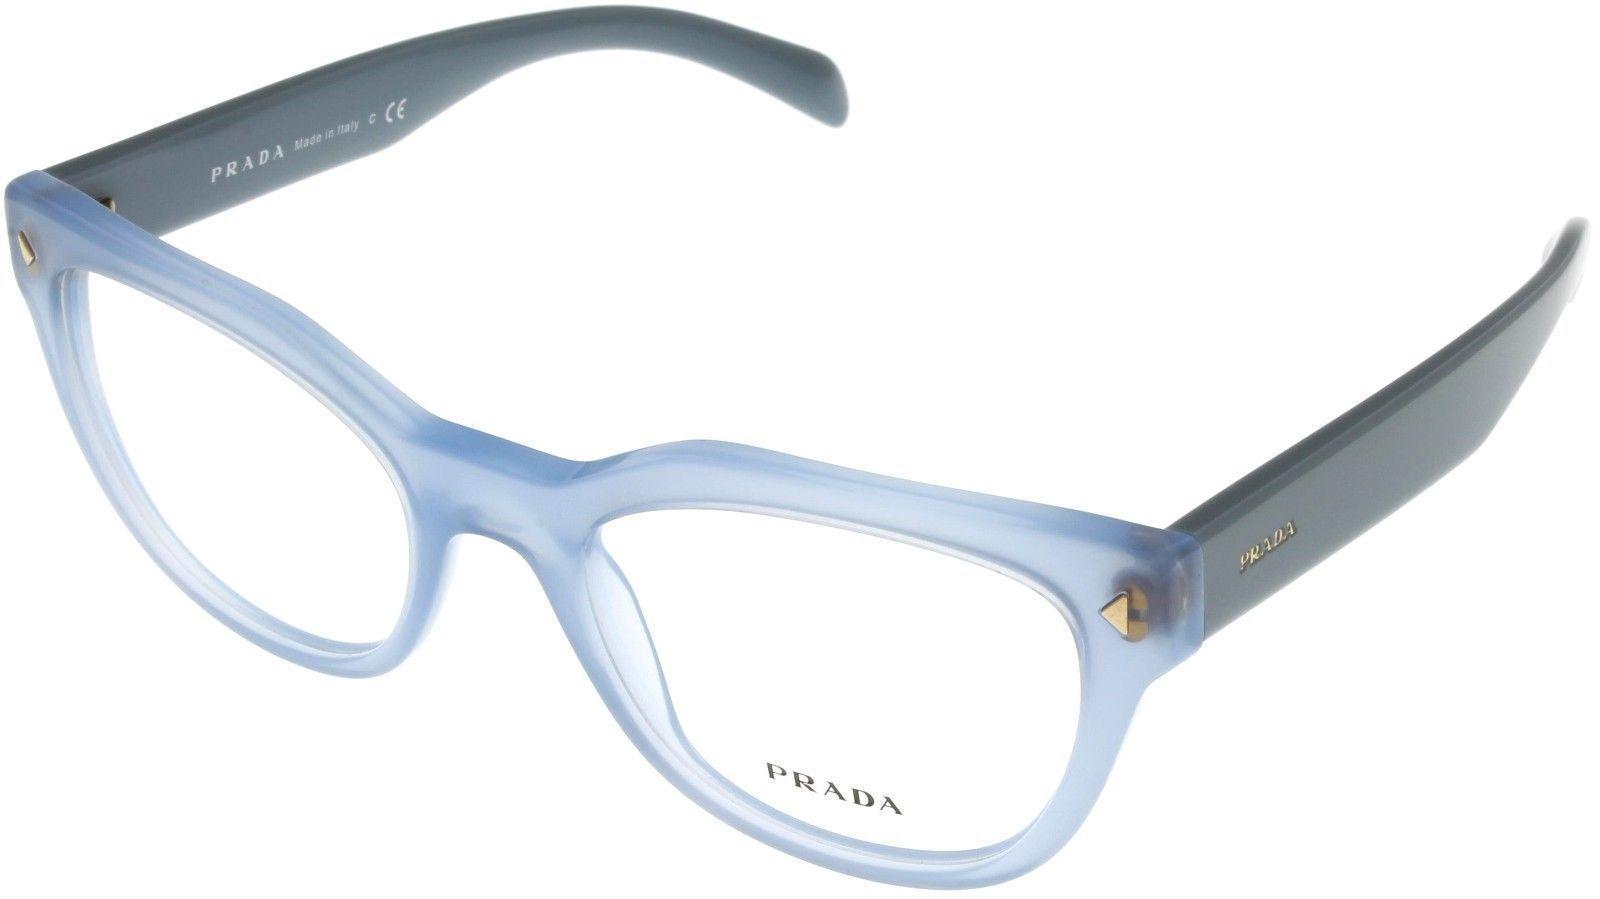 cab1579f08ee Prada Eyewear Frame Blue Azure Cat Eye Women and 38 similar items. 57